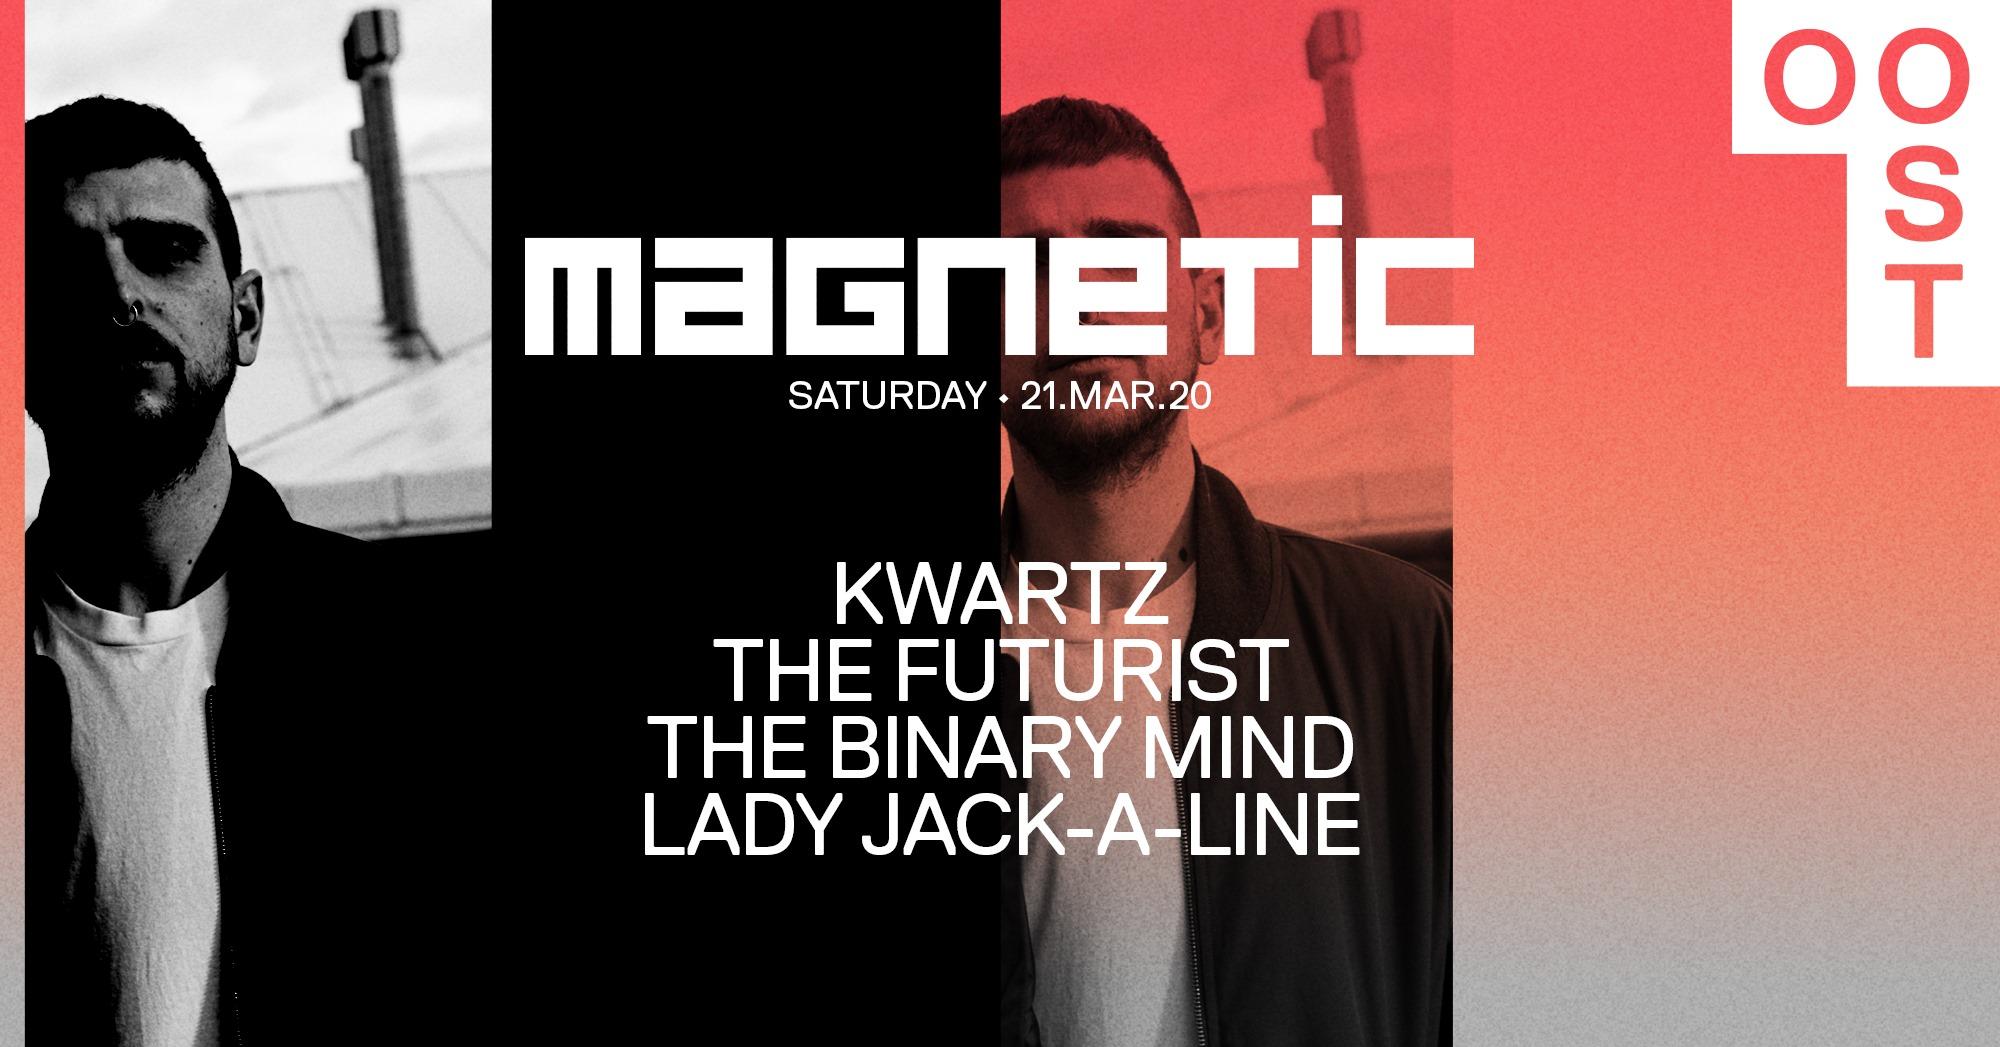 Magnetic @ OOST - Kwartz 21-03-2020